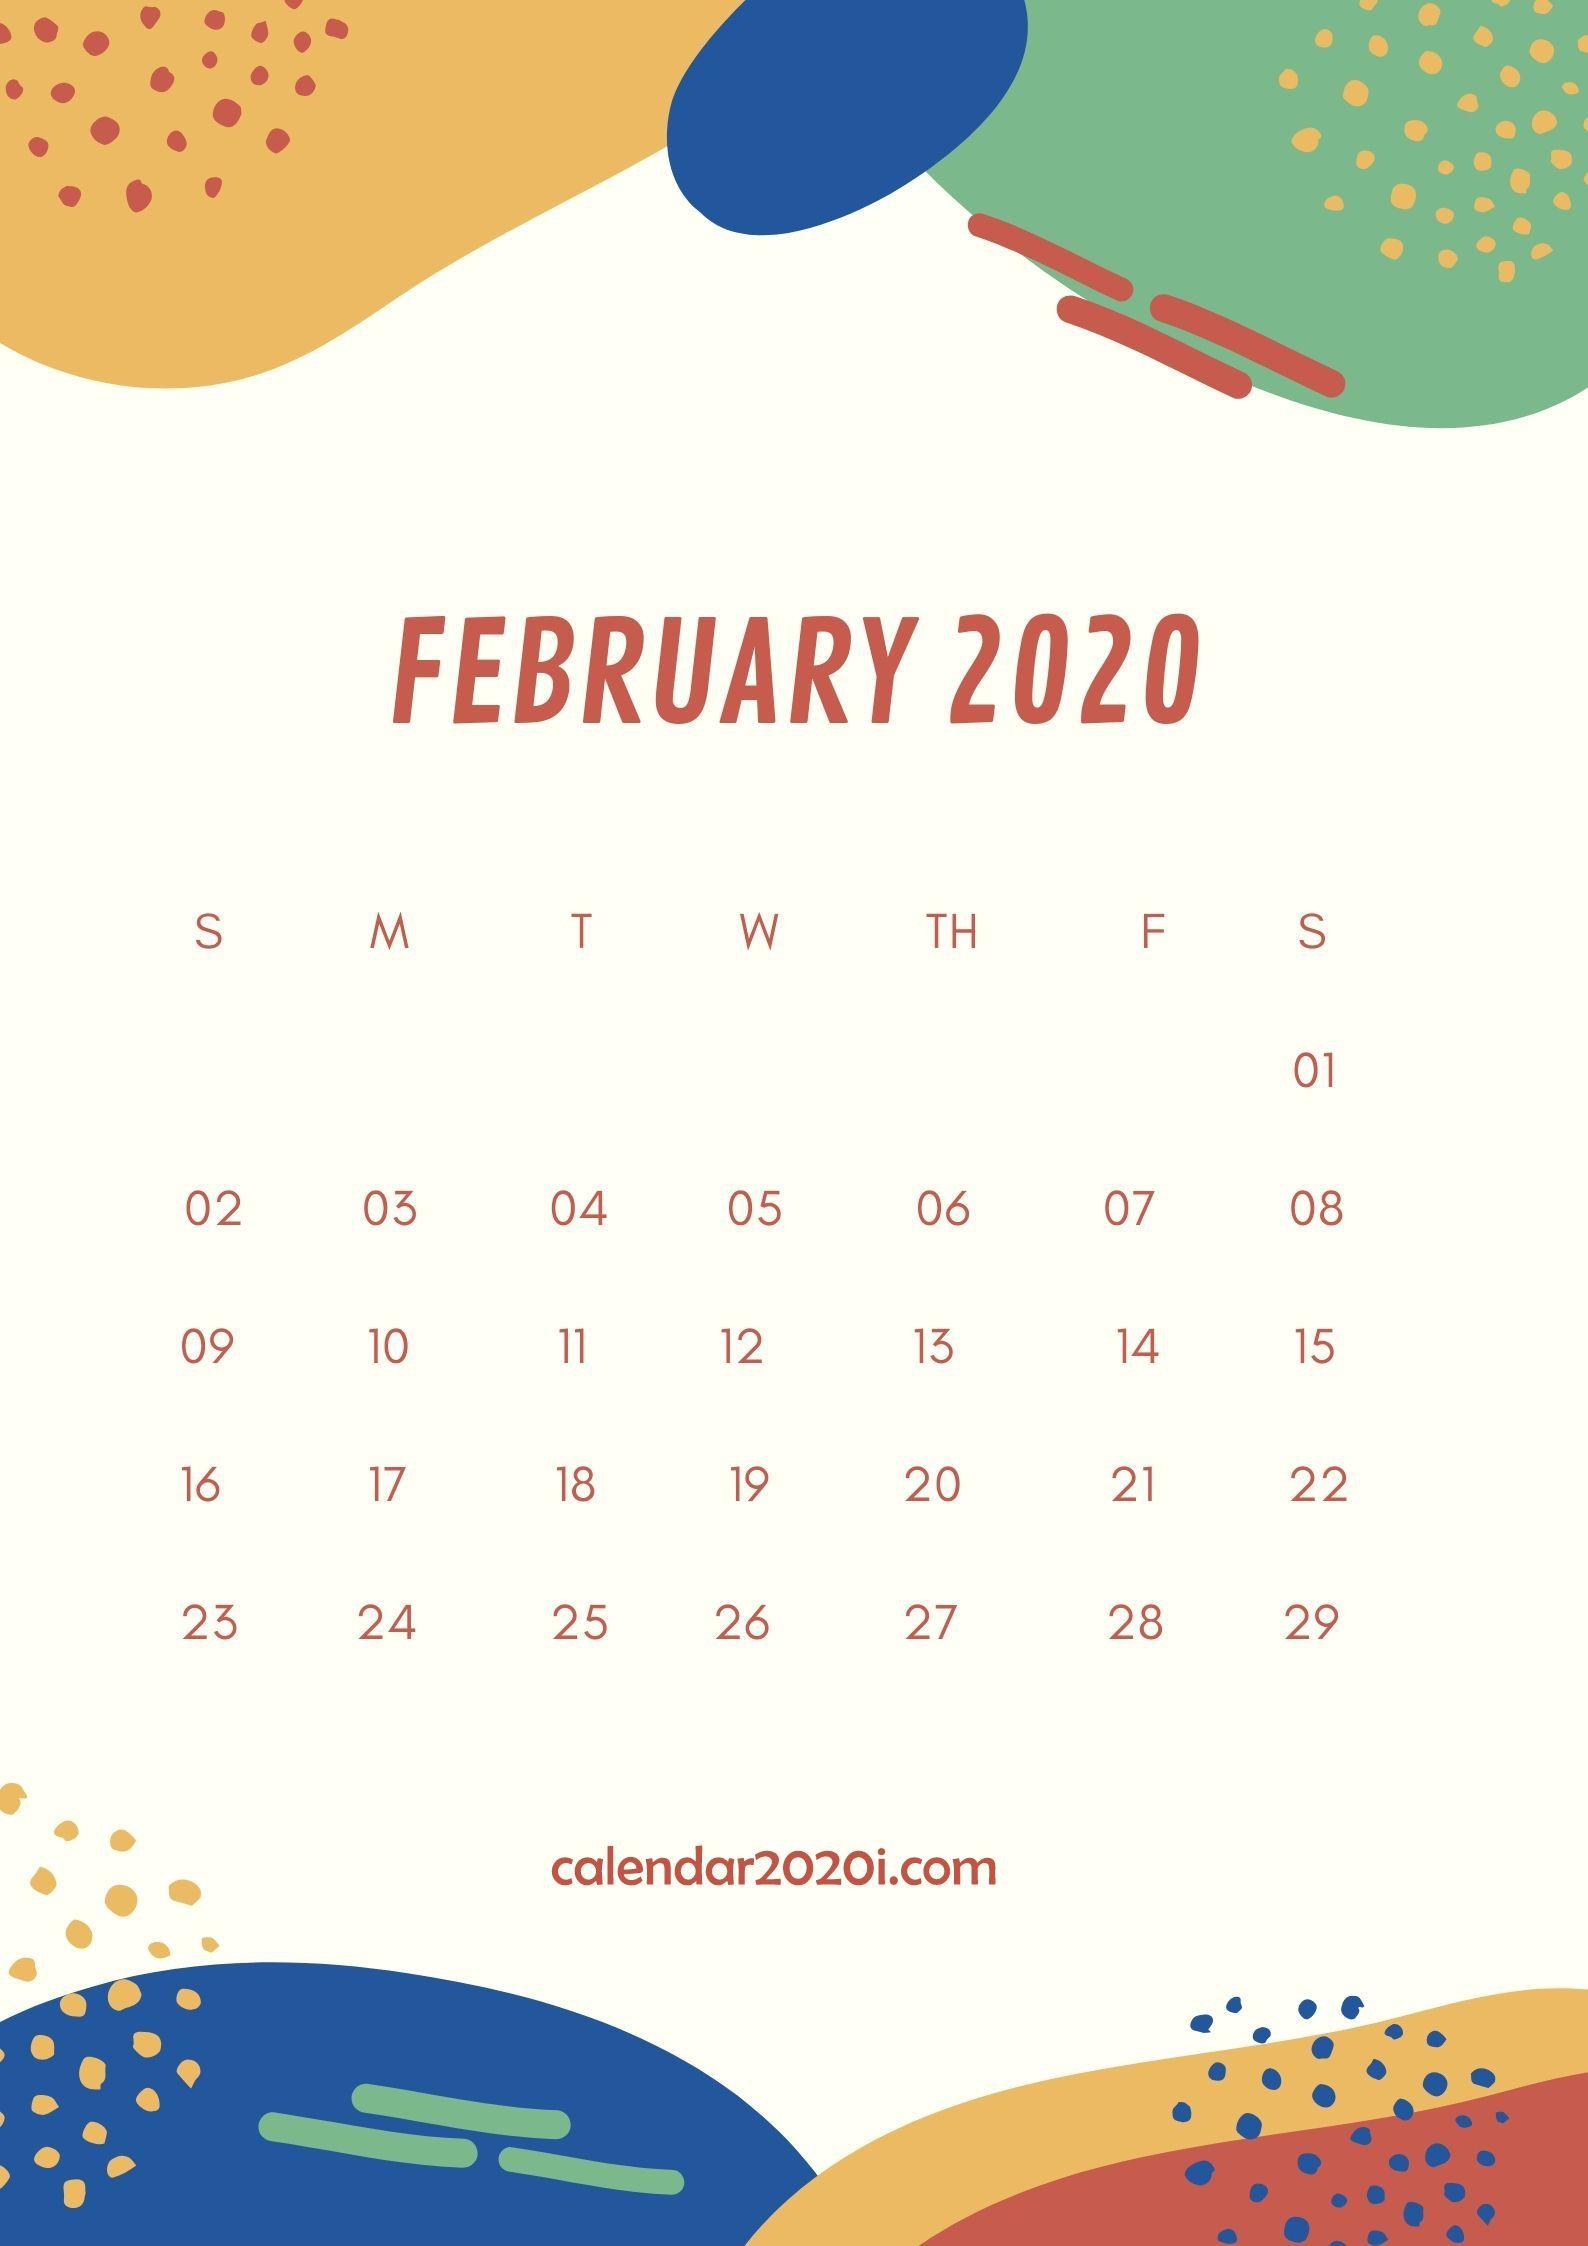 February 2020 Wall Calendar Printable